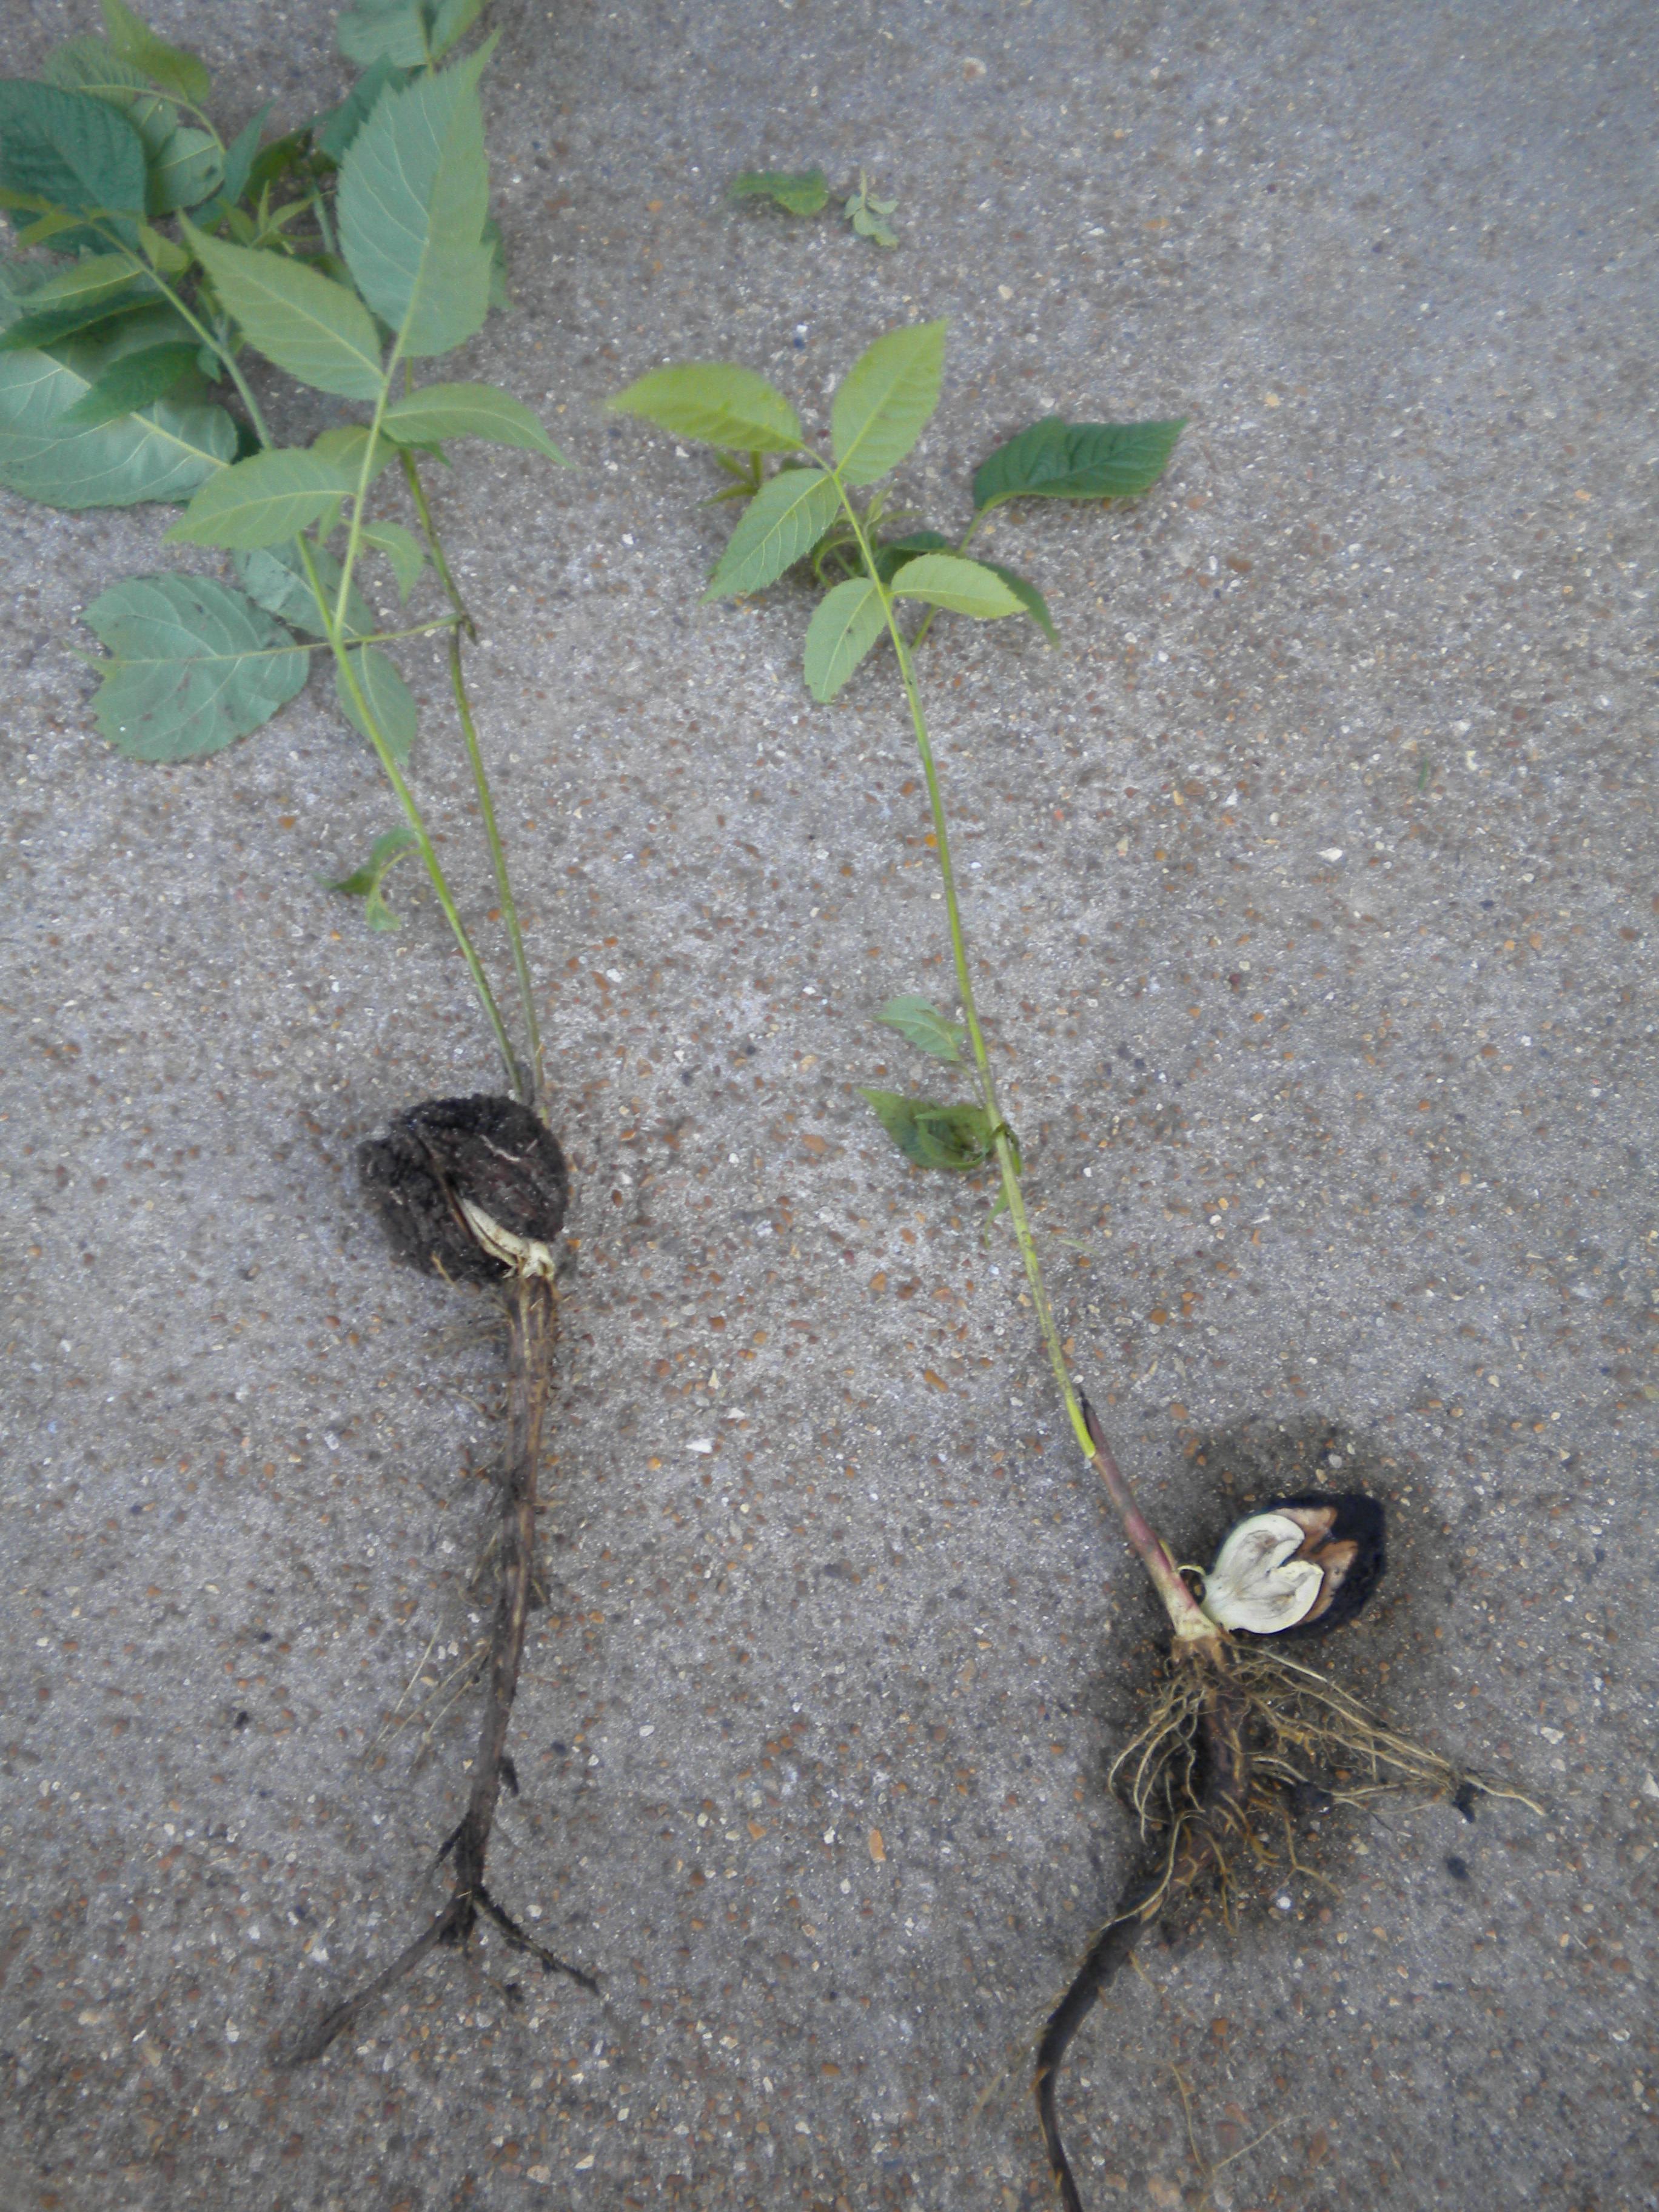 A Black Walnut Tree Nature Study | My Soul Doth Delight…